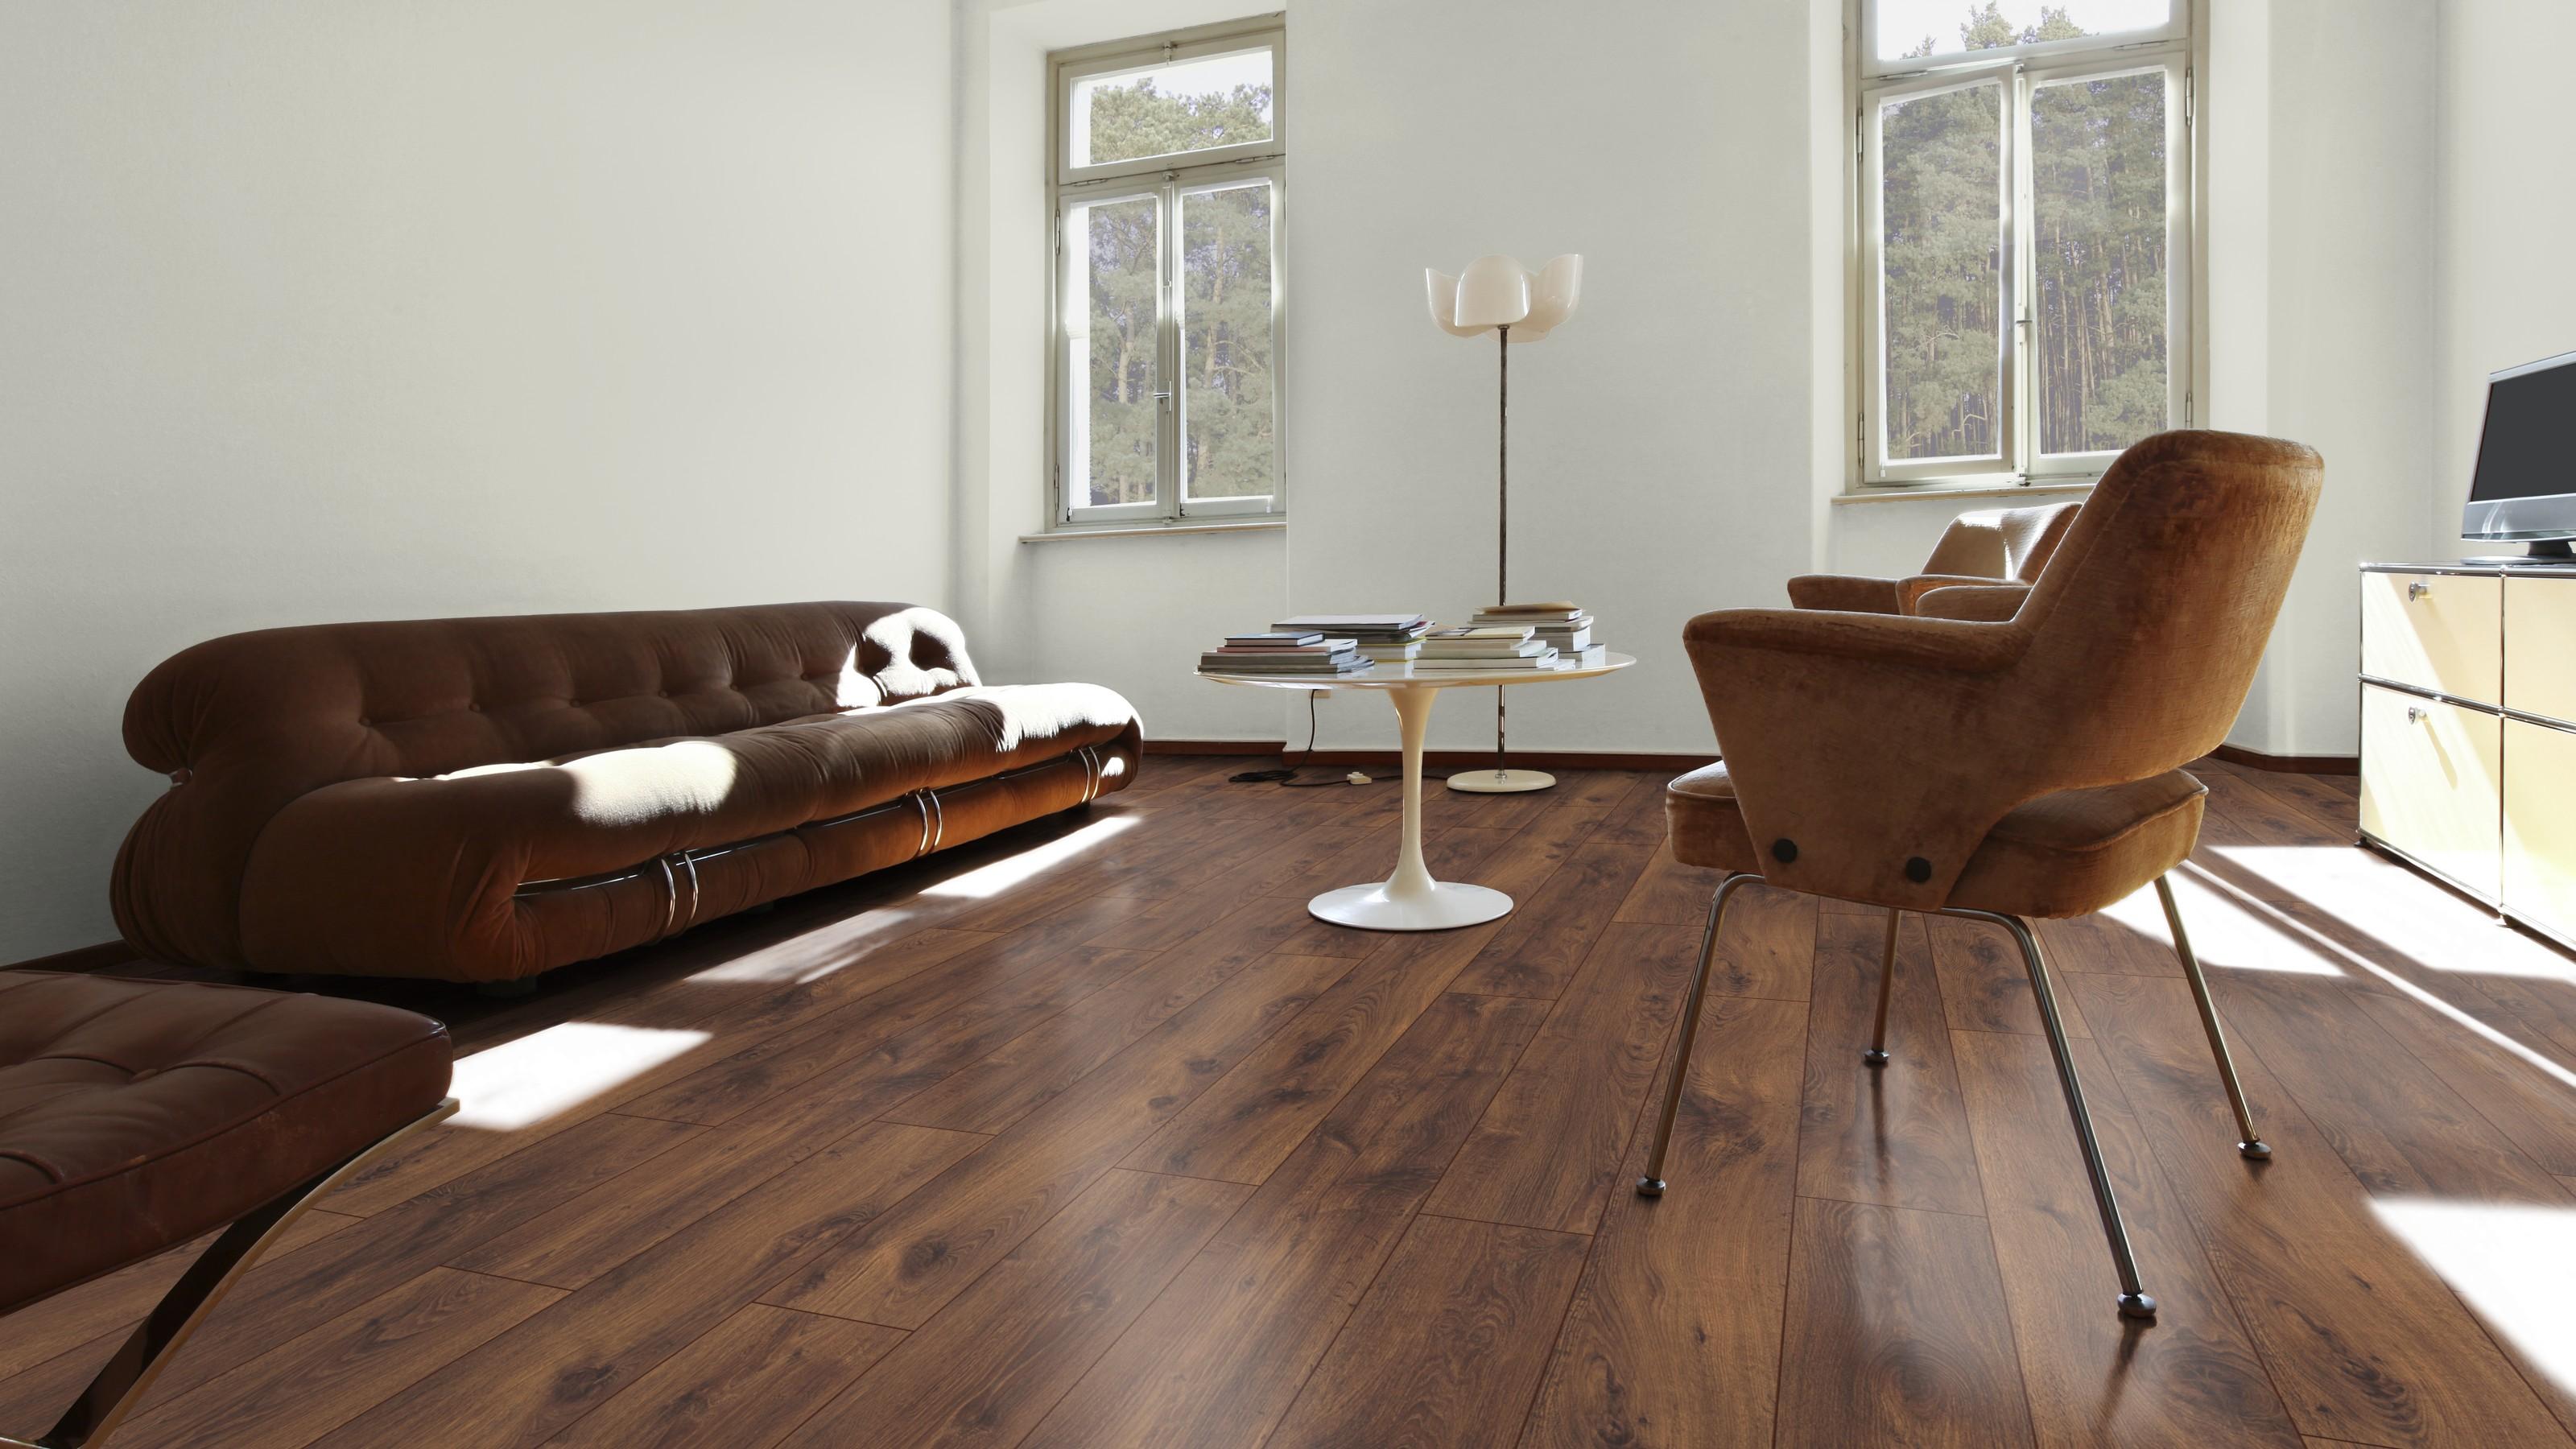 Loft oak villeroy boch london premium laminate flooring for Laminate flooring london